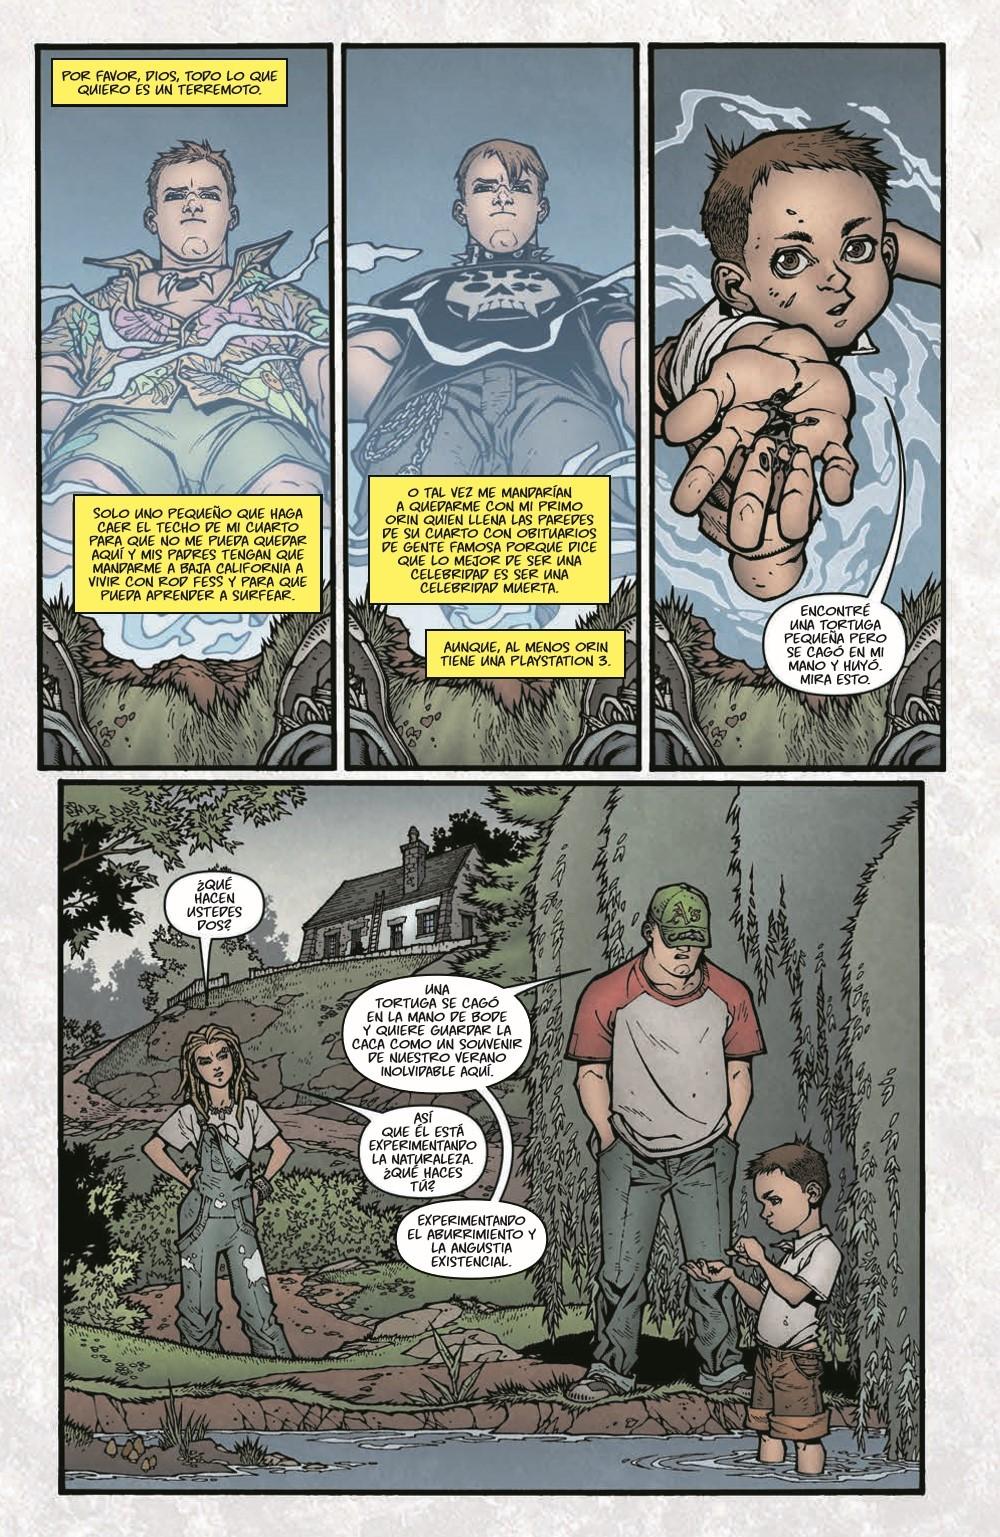 LockeandKey_TPB_pr-7 ComicList Previews: LOCKE AND KEY VOLUME 1 BIENVENIDOS A LOVECRAFT TP